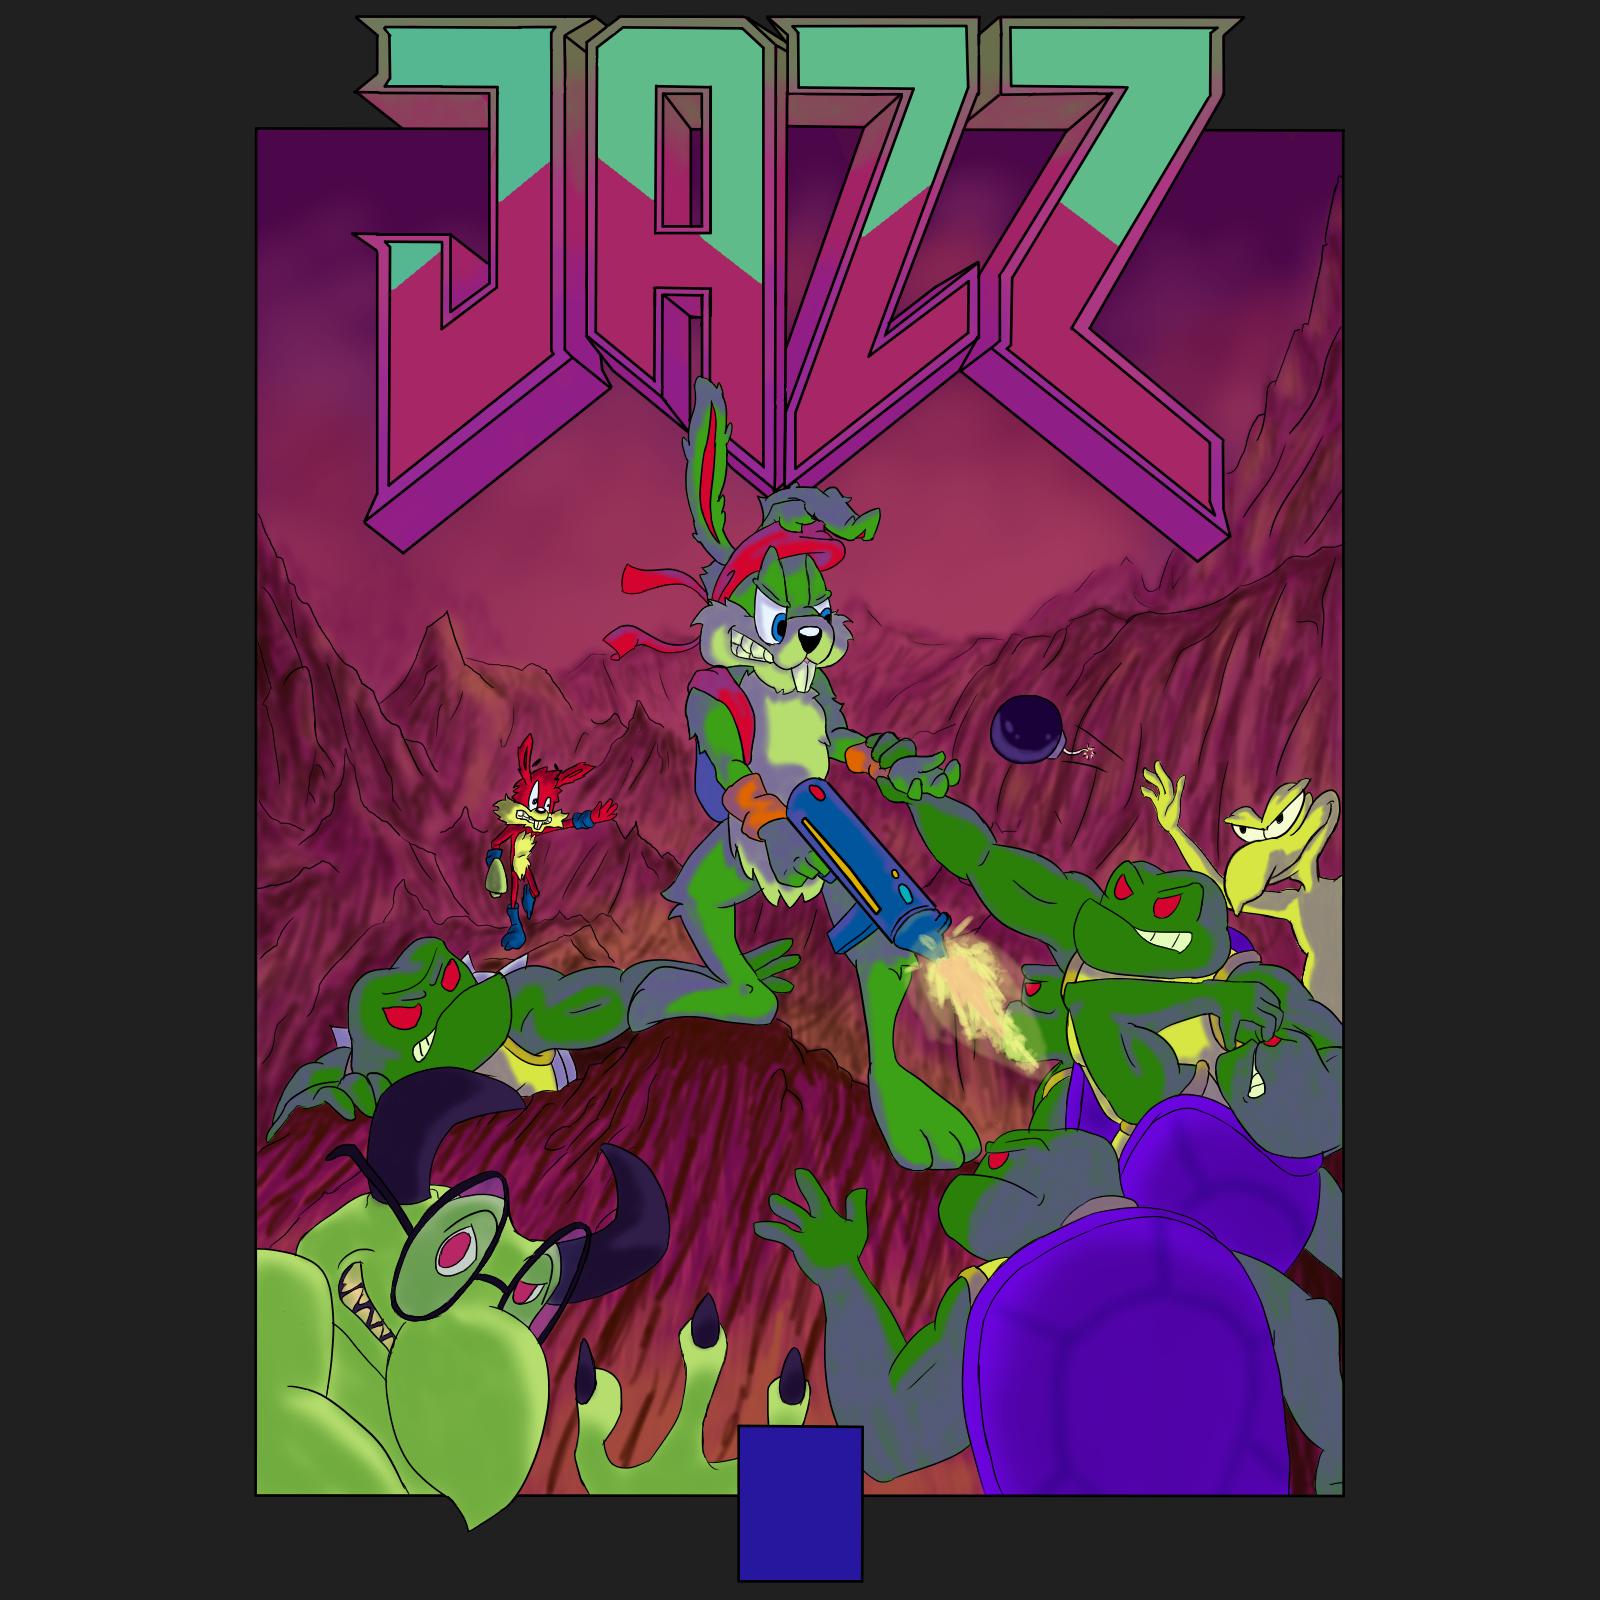 Jazz is Doomed